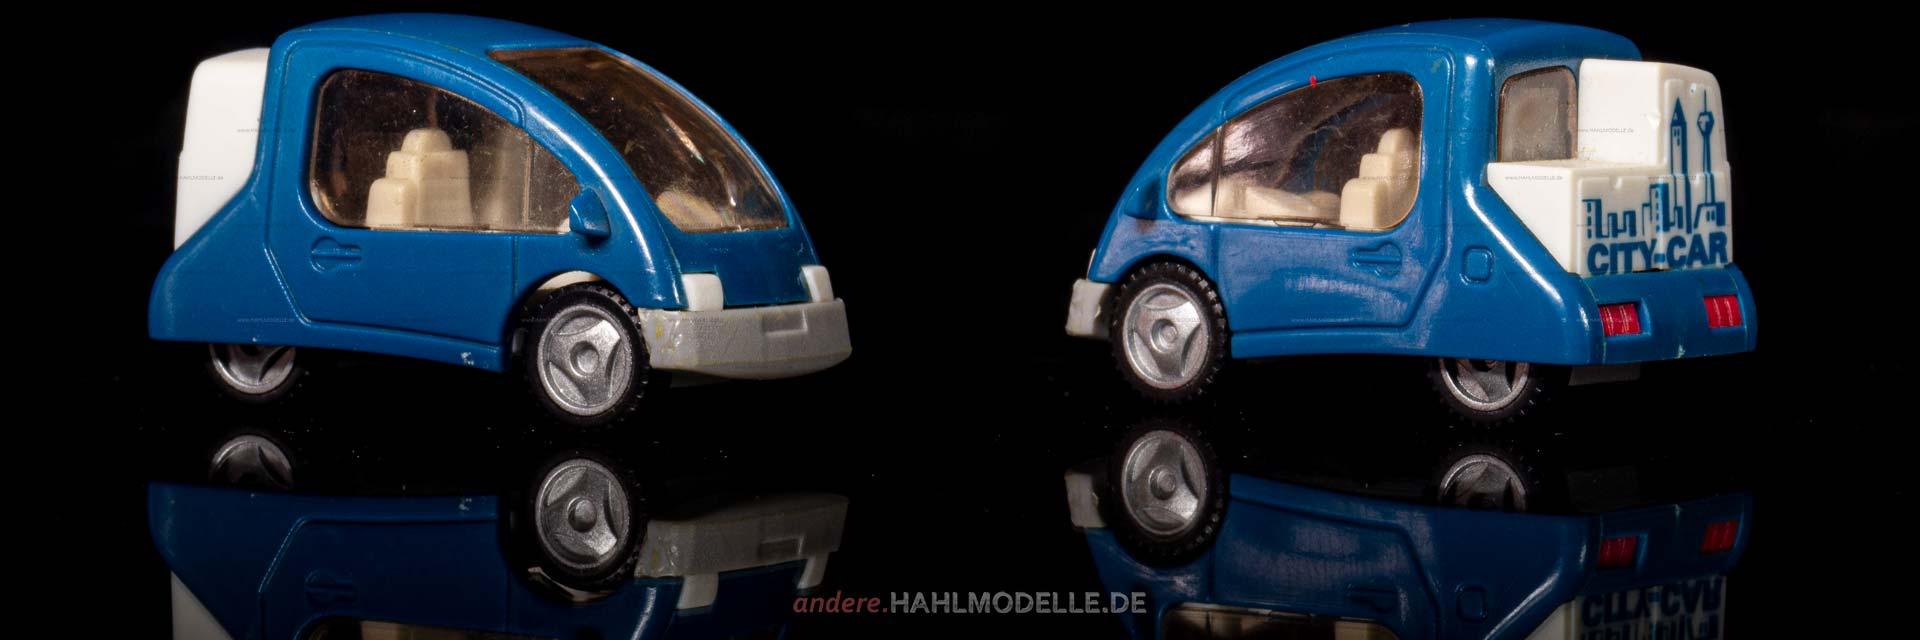 """Street-Hopper"" | Kleinstwagen | Ferrero Überraschungsei | www.andere.hahlmodelle.de"